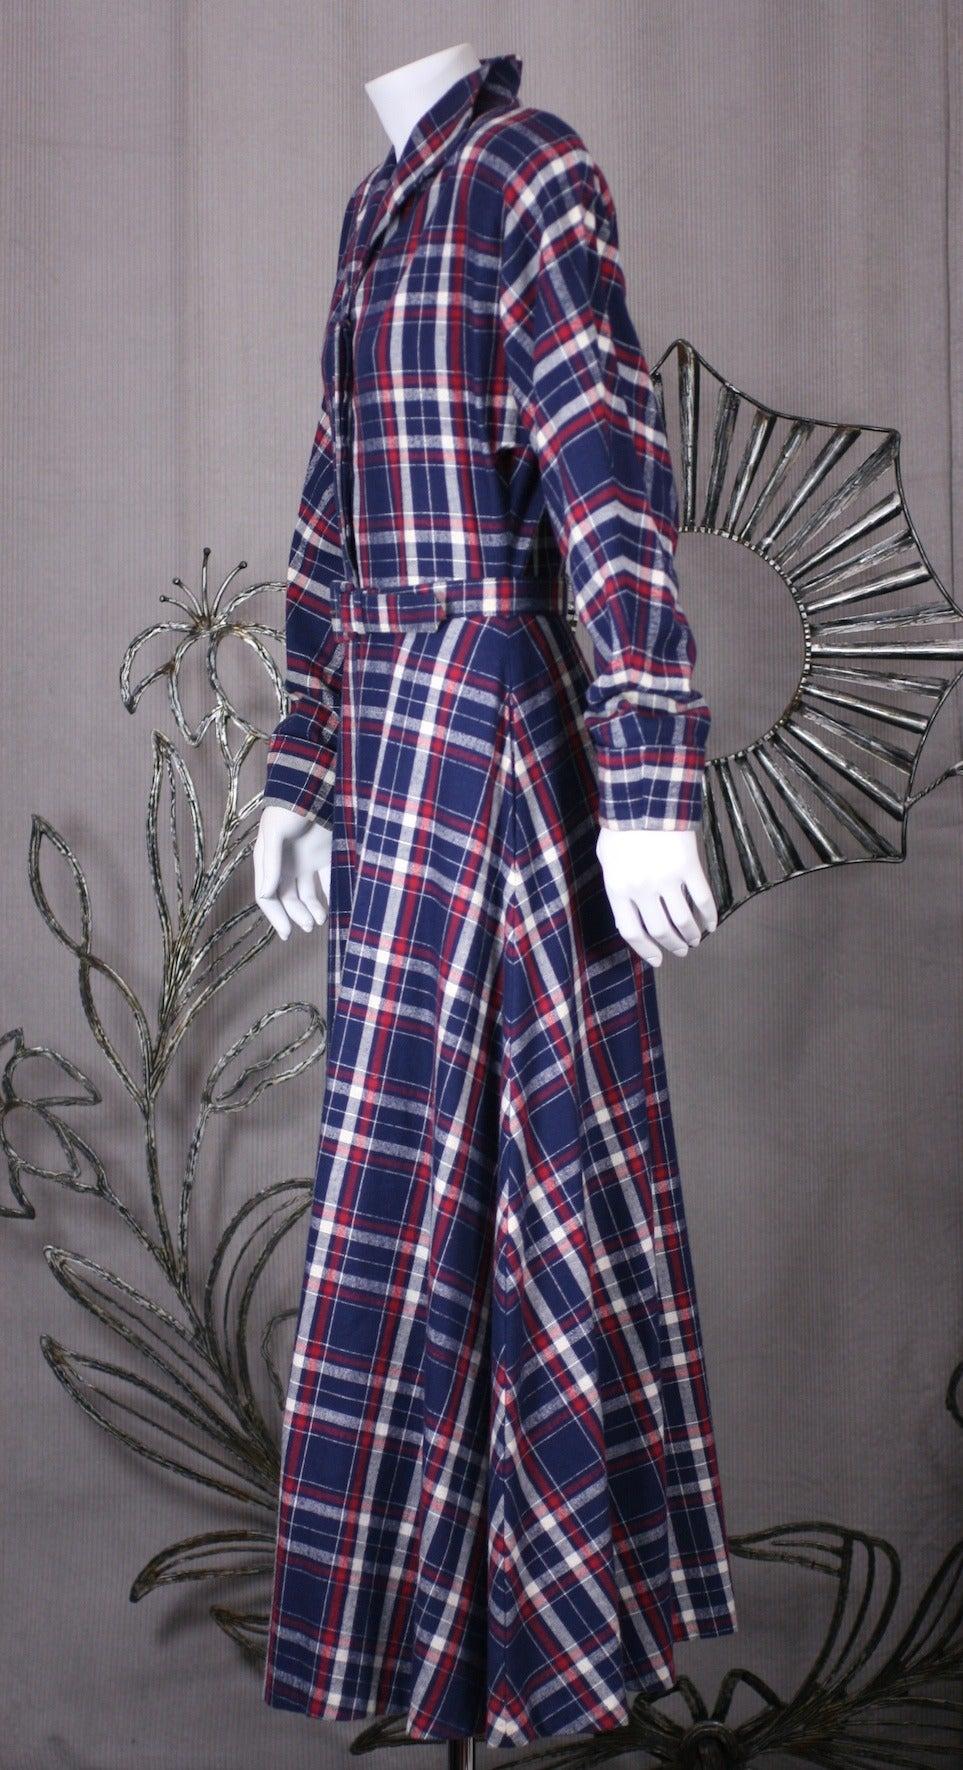 Black Norma Kamali's Patriotic Flannel Shirtwaist